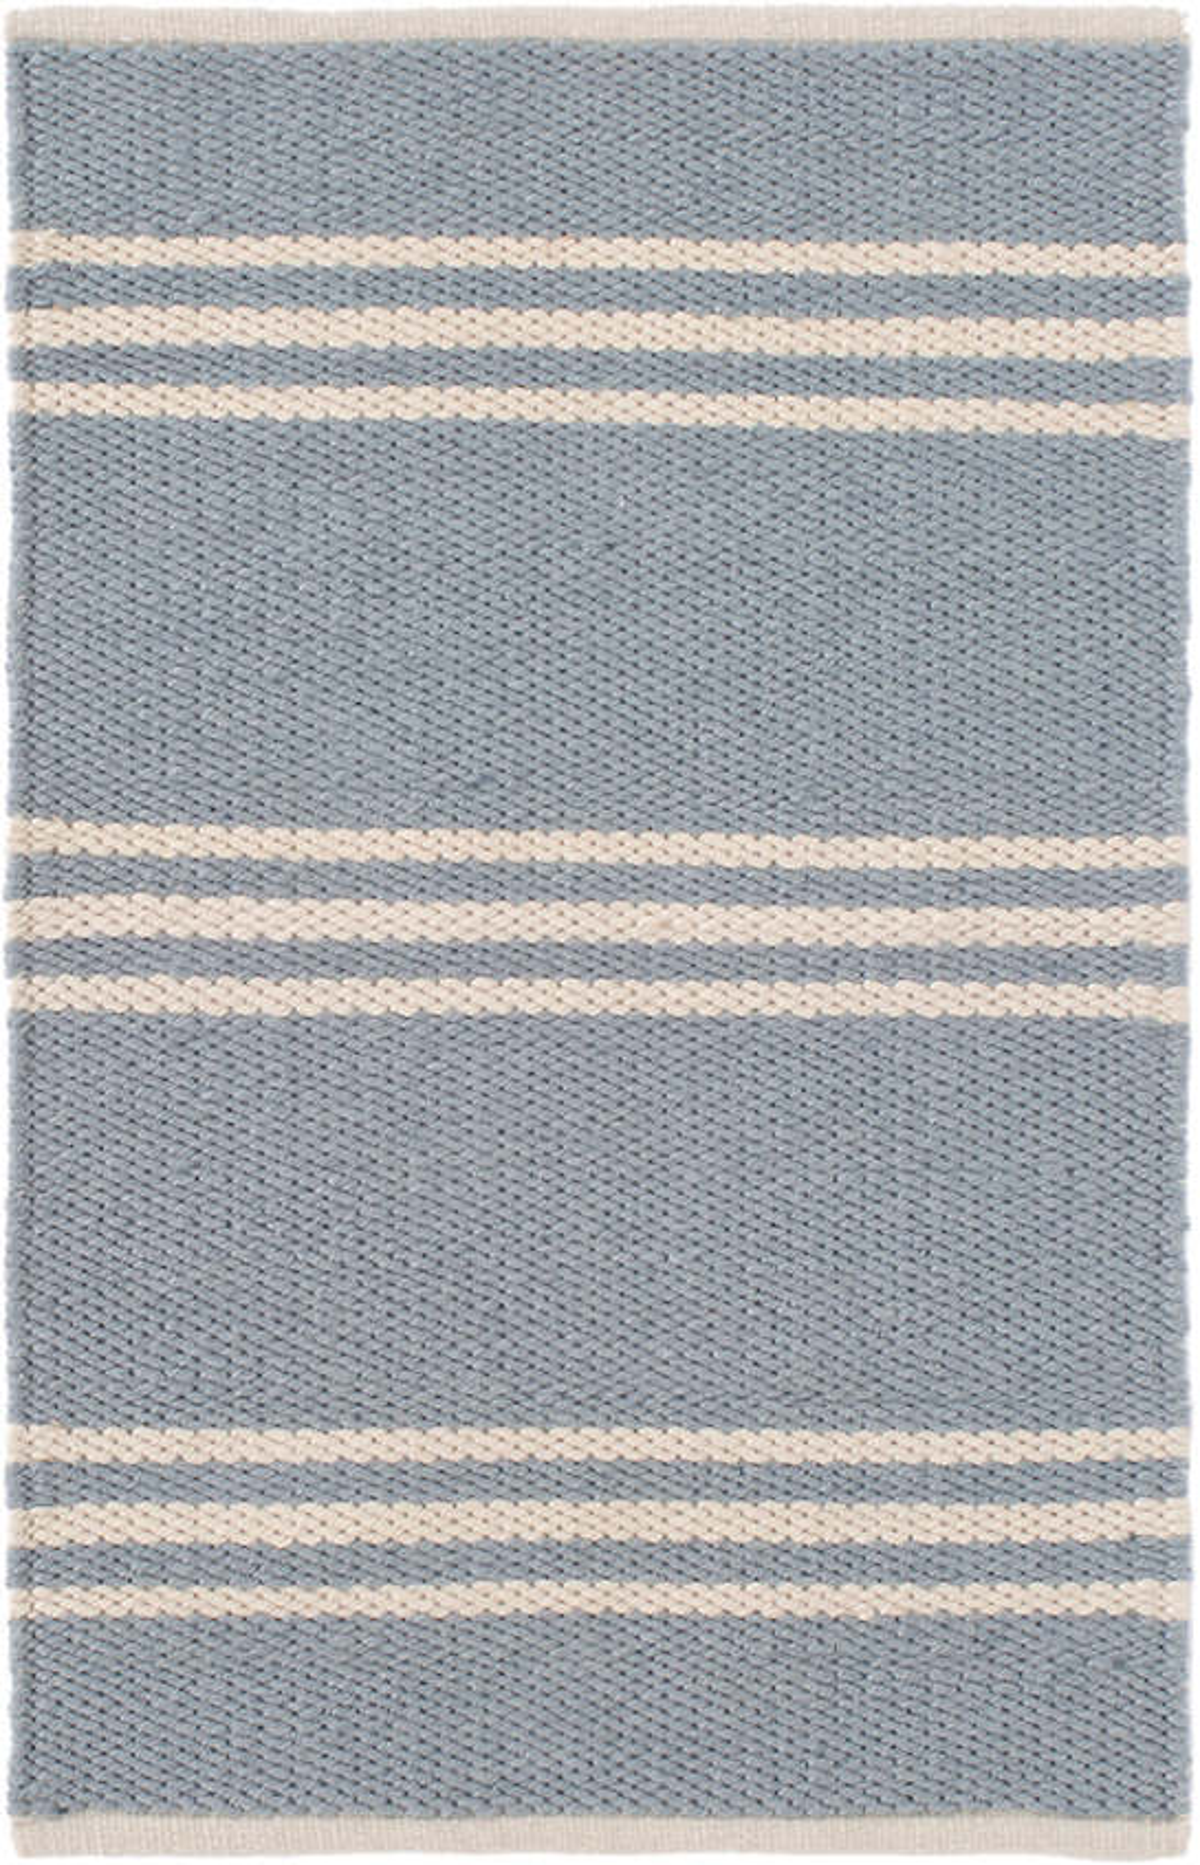 Lexington Swedish Blue/Ivory Indoor/Outdoor Rug